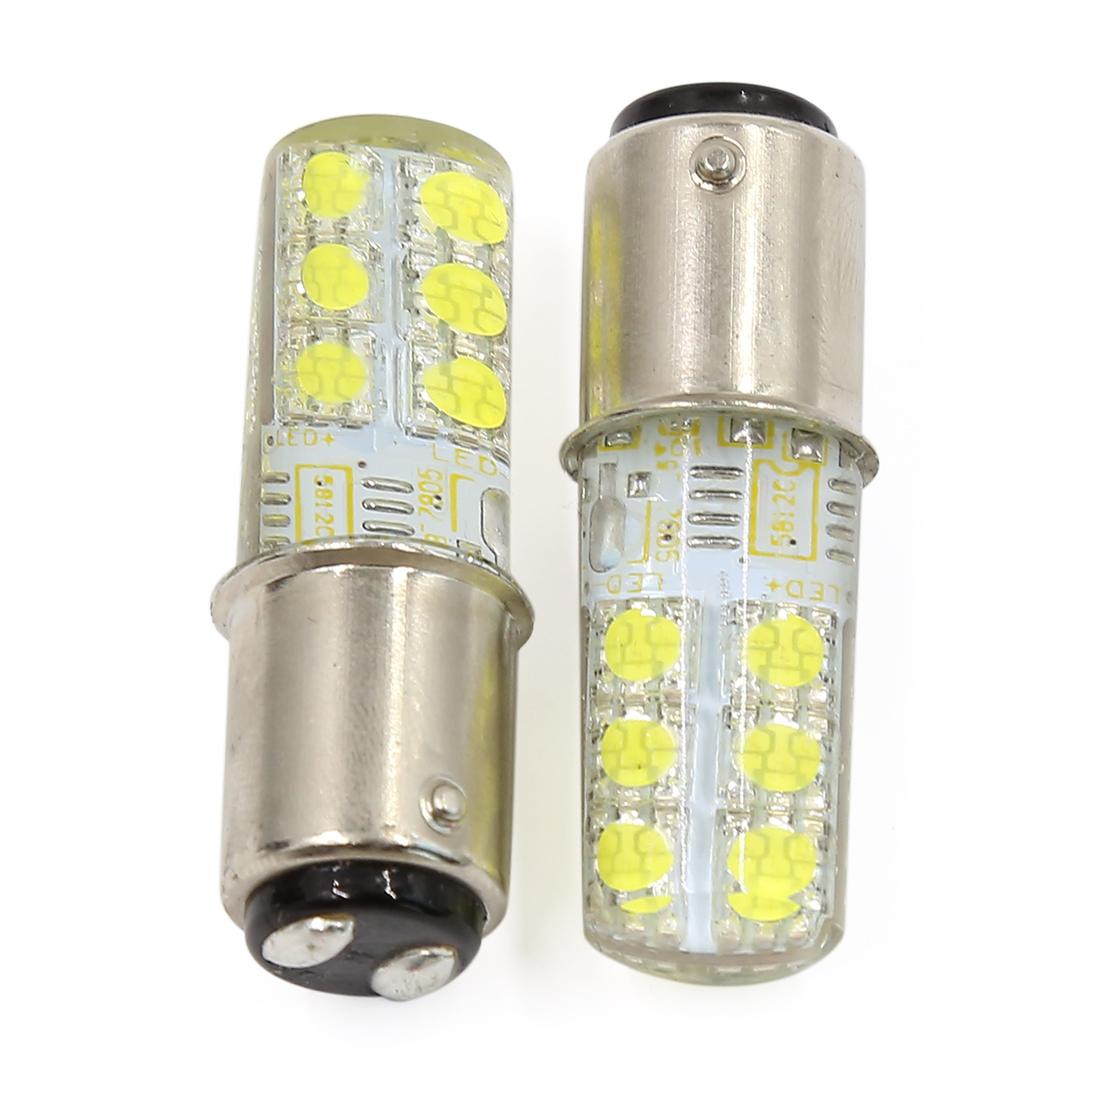 2 Pcs Silicone 1157 BAY15D White 12 LED Car Parking Light Tail Brake Lamp DC 12V